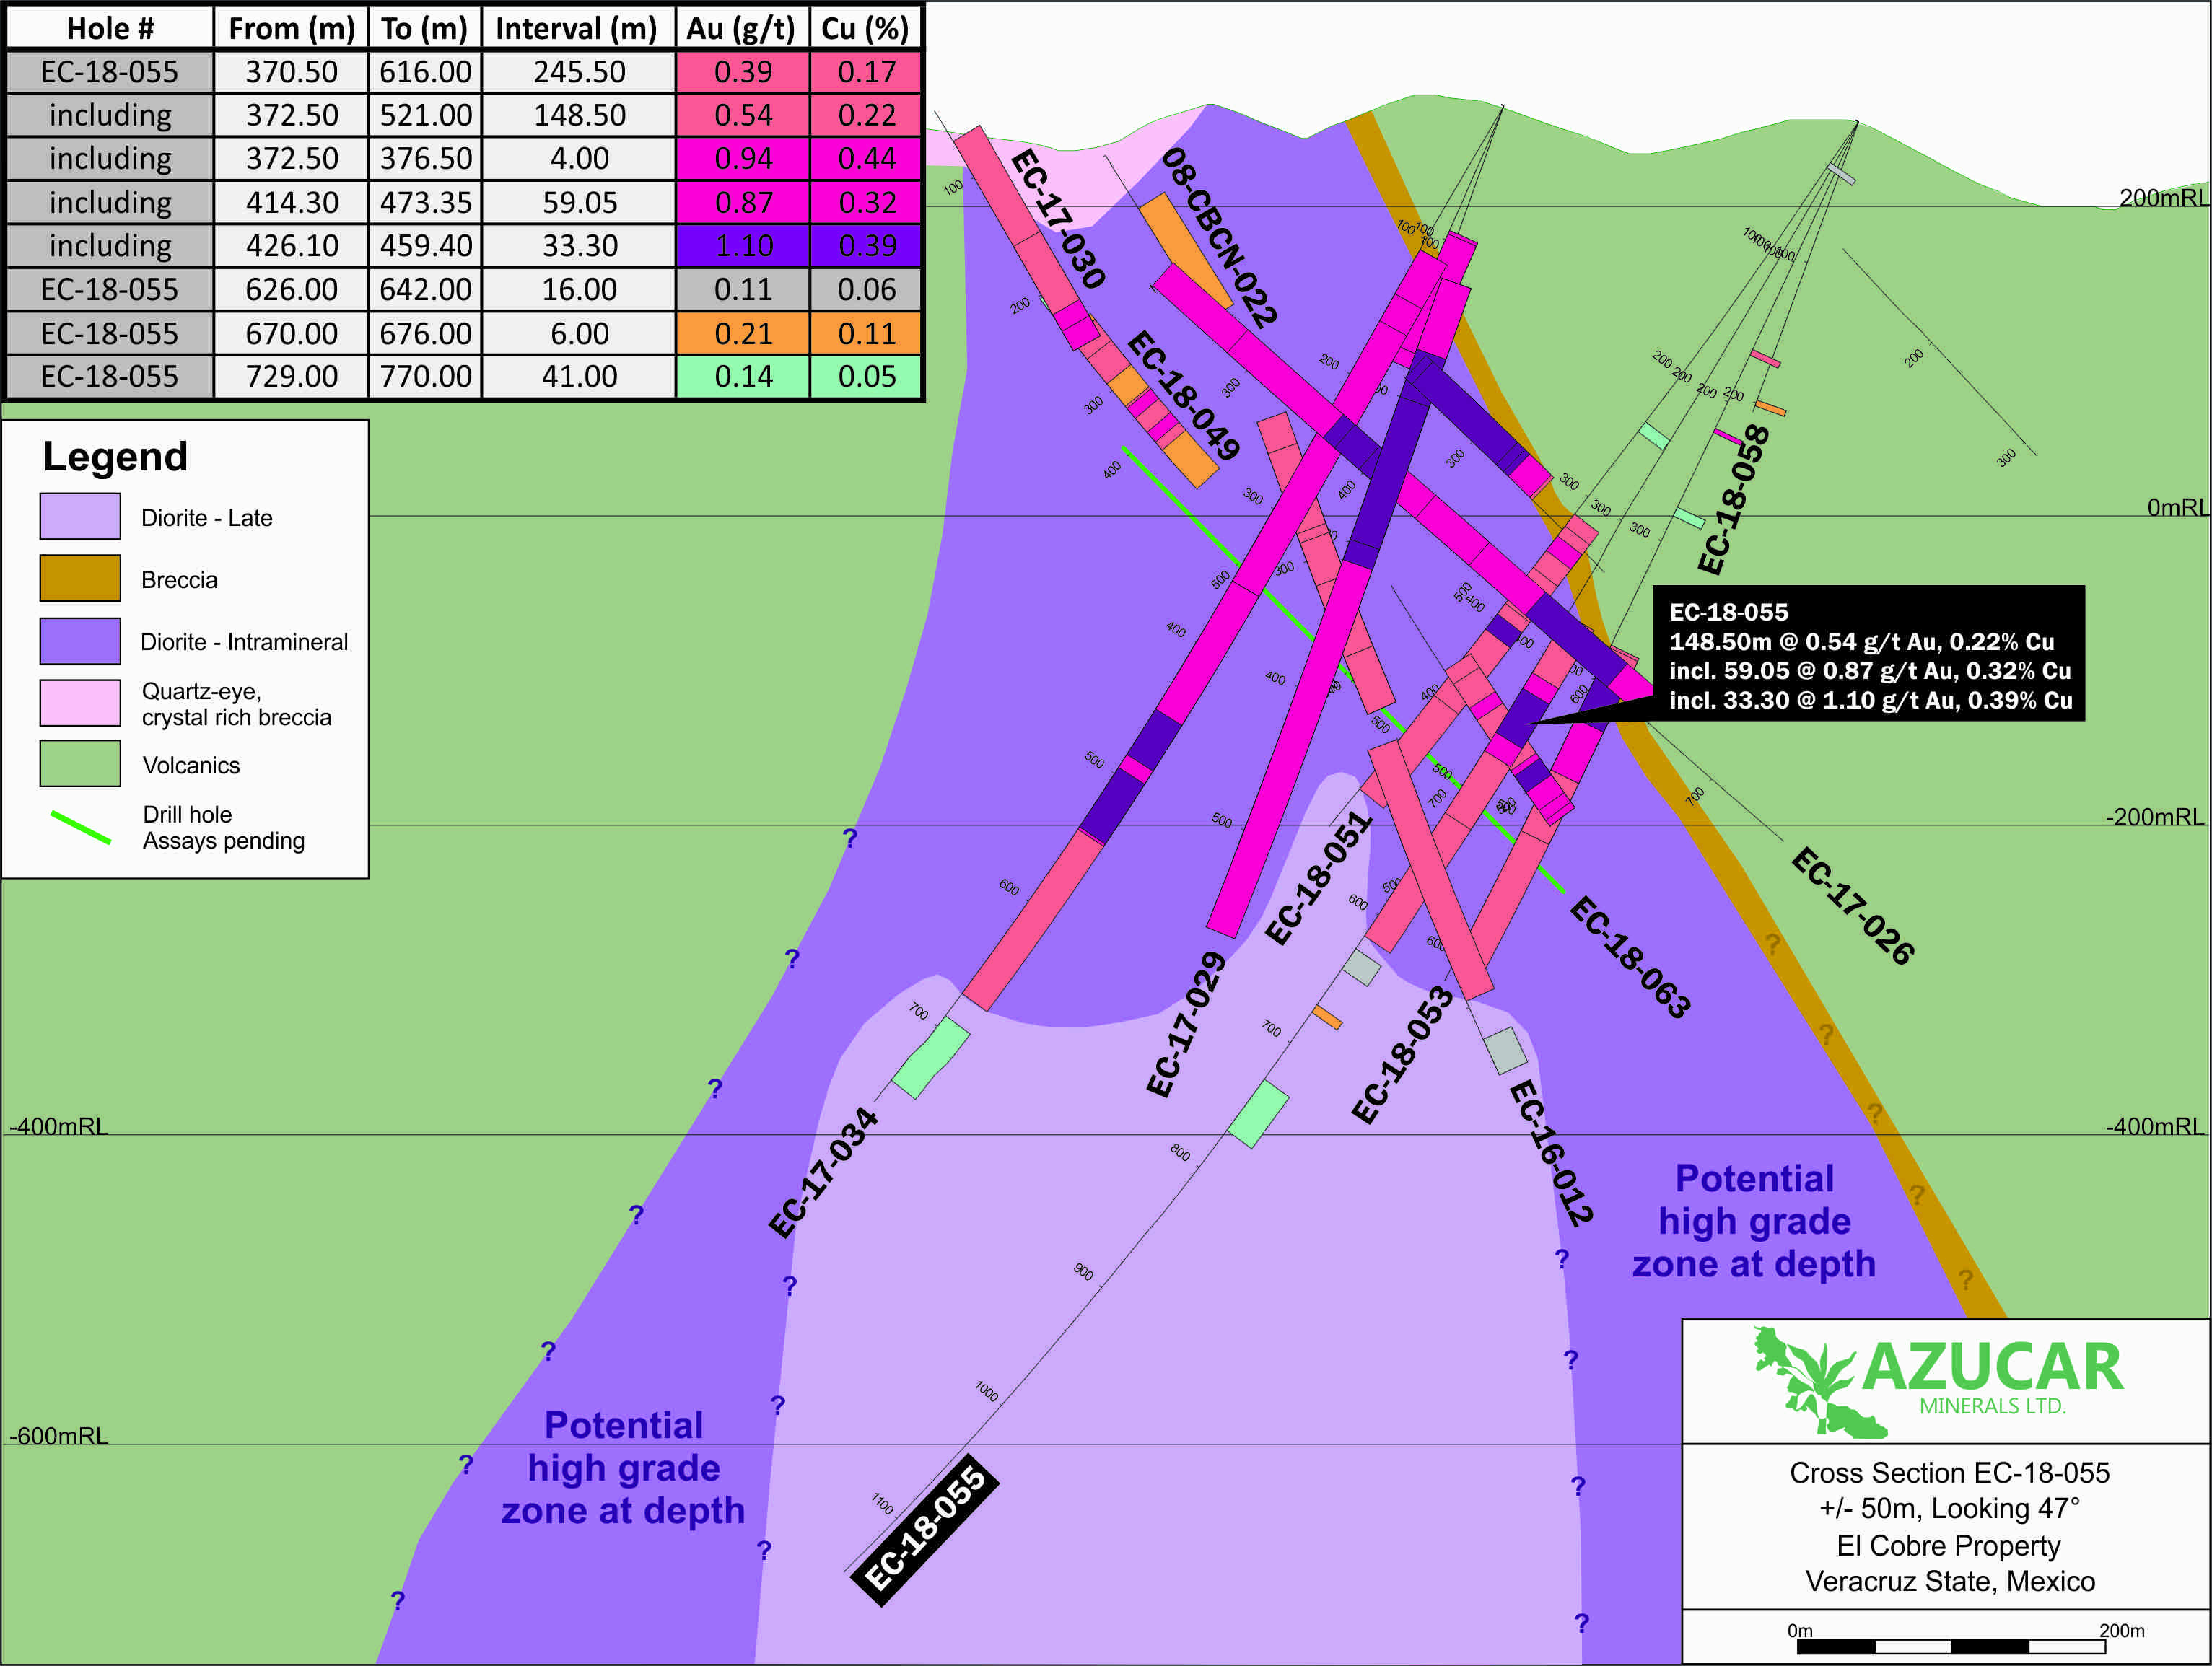 Cross Section EC-18-055